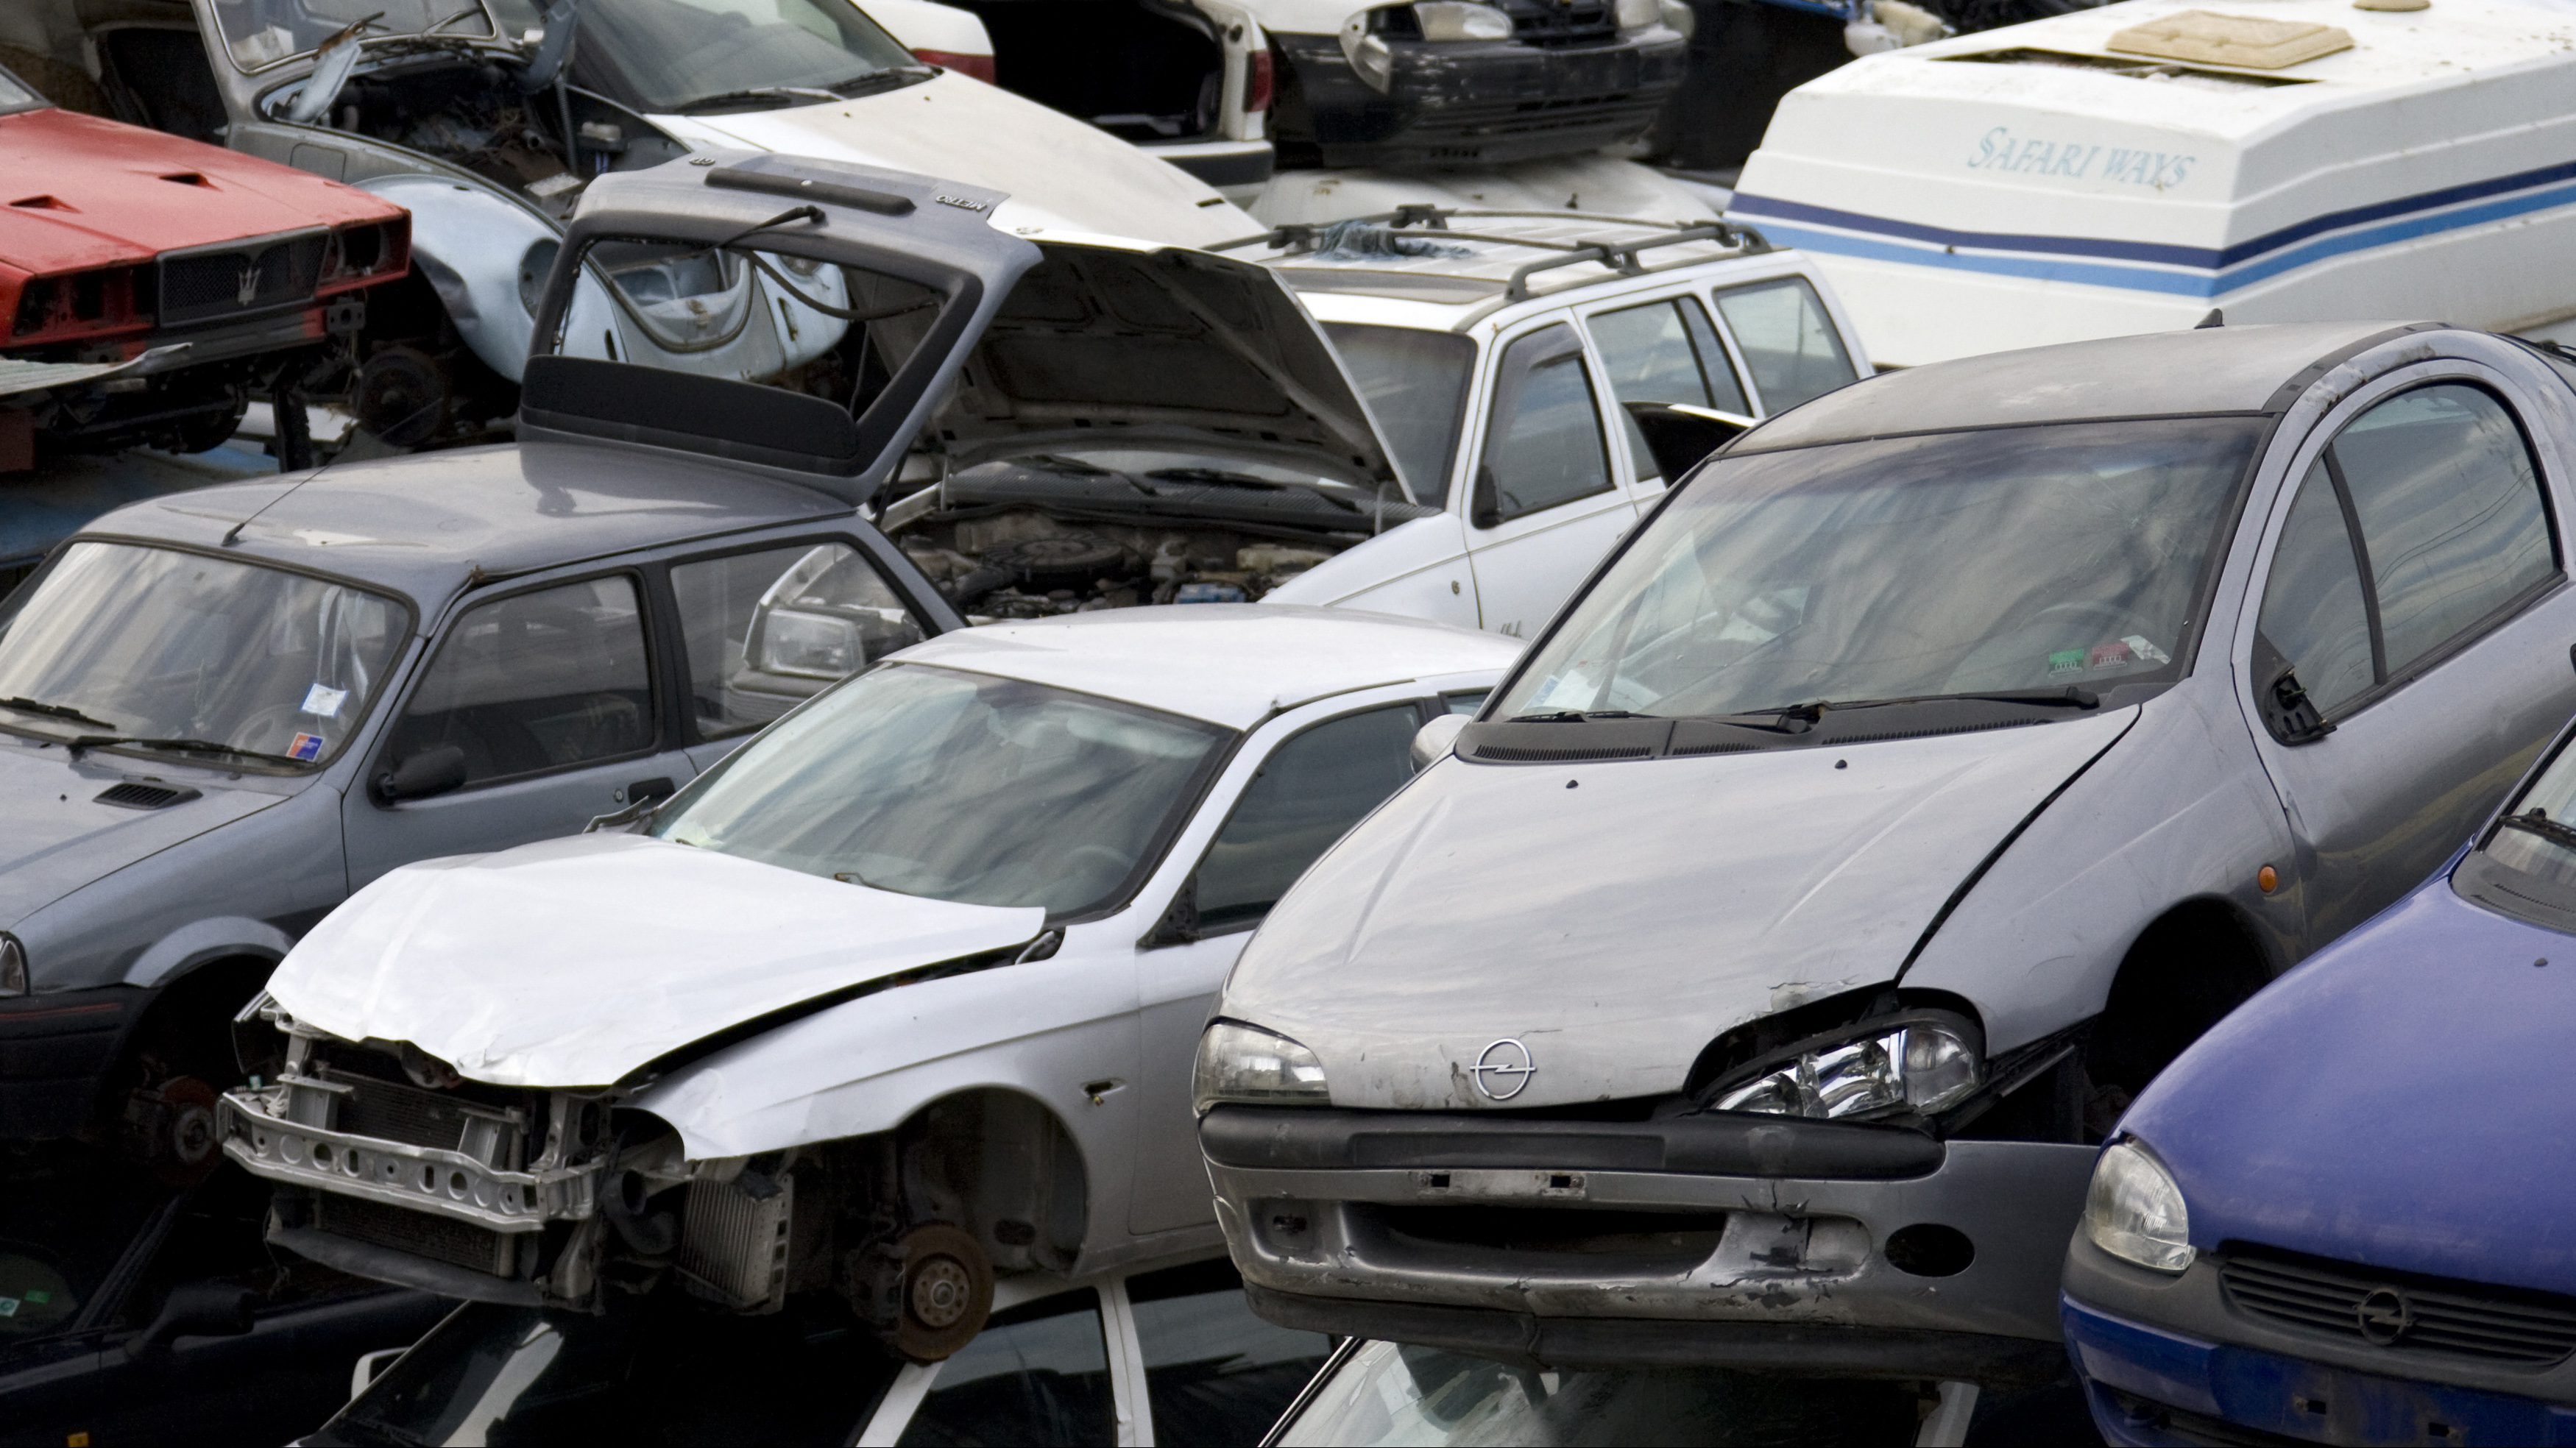 Stacks of wrecked cars are seen in a scrapyard in Rome November 17, 2008.    REUTERS/Chris Helgren        (ITALY) - GM1E4BI02FM01